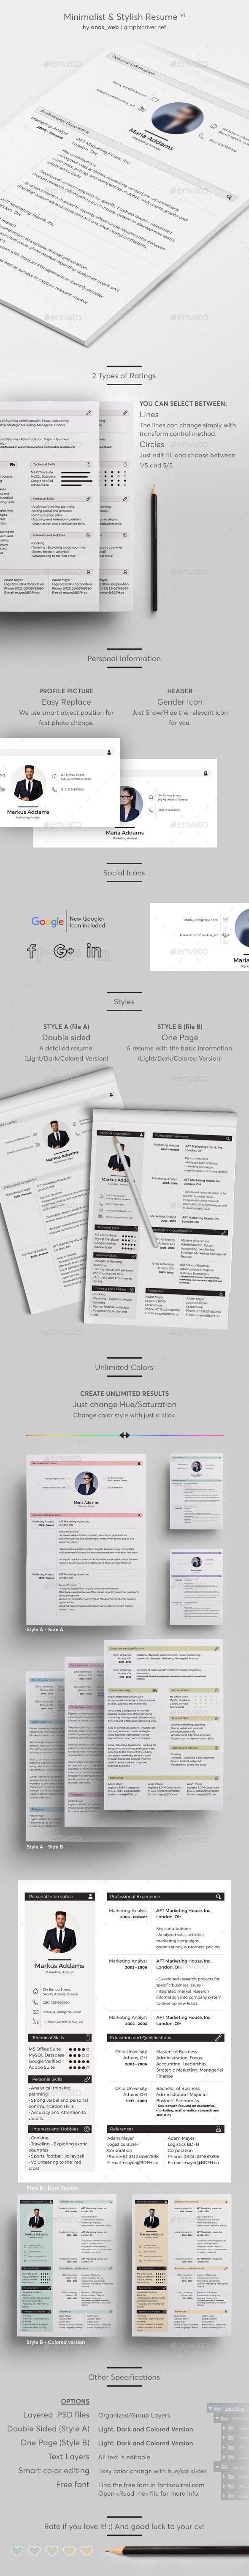 #Minimalist & #Stylish Resume - #Resumes #Stationery Download here: https://graphicriver.net/item/minimalist-stylish-resume/12838204?ref=alena994